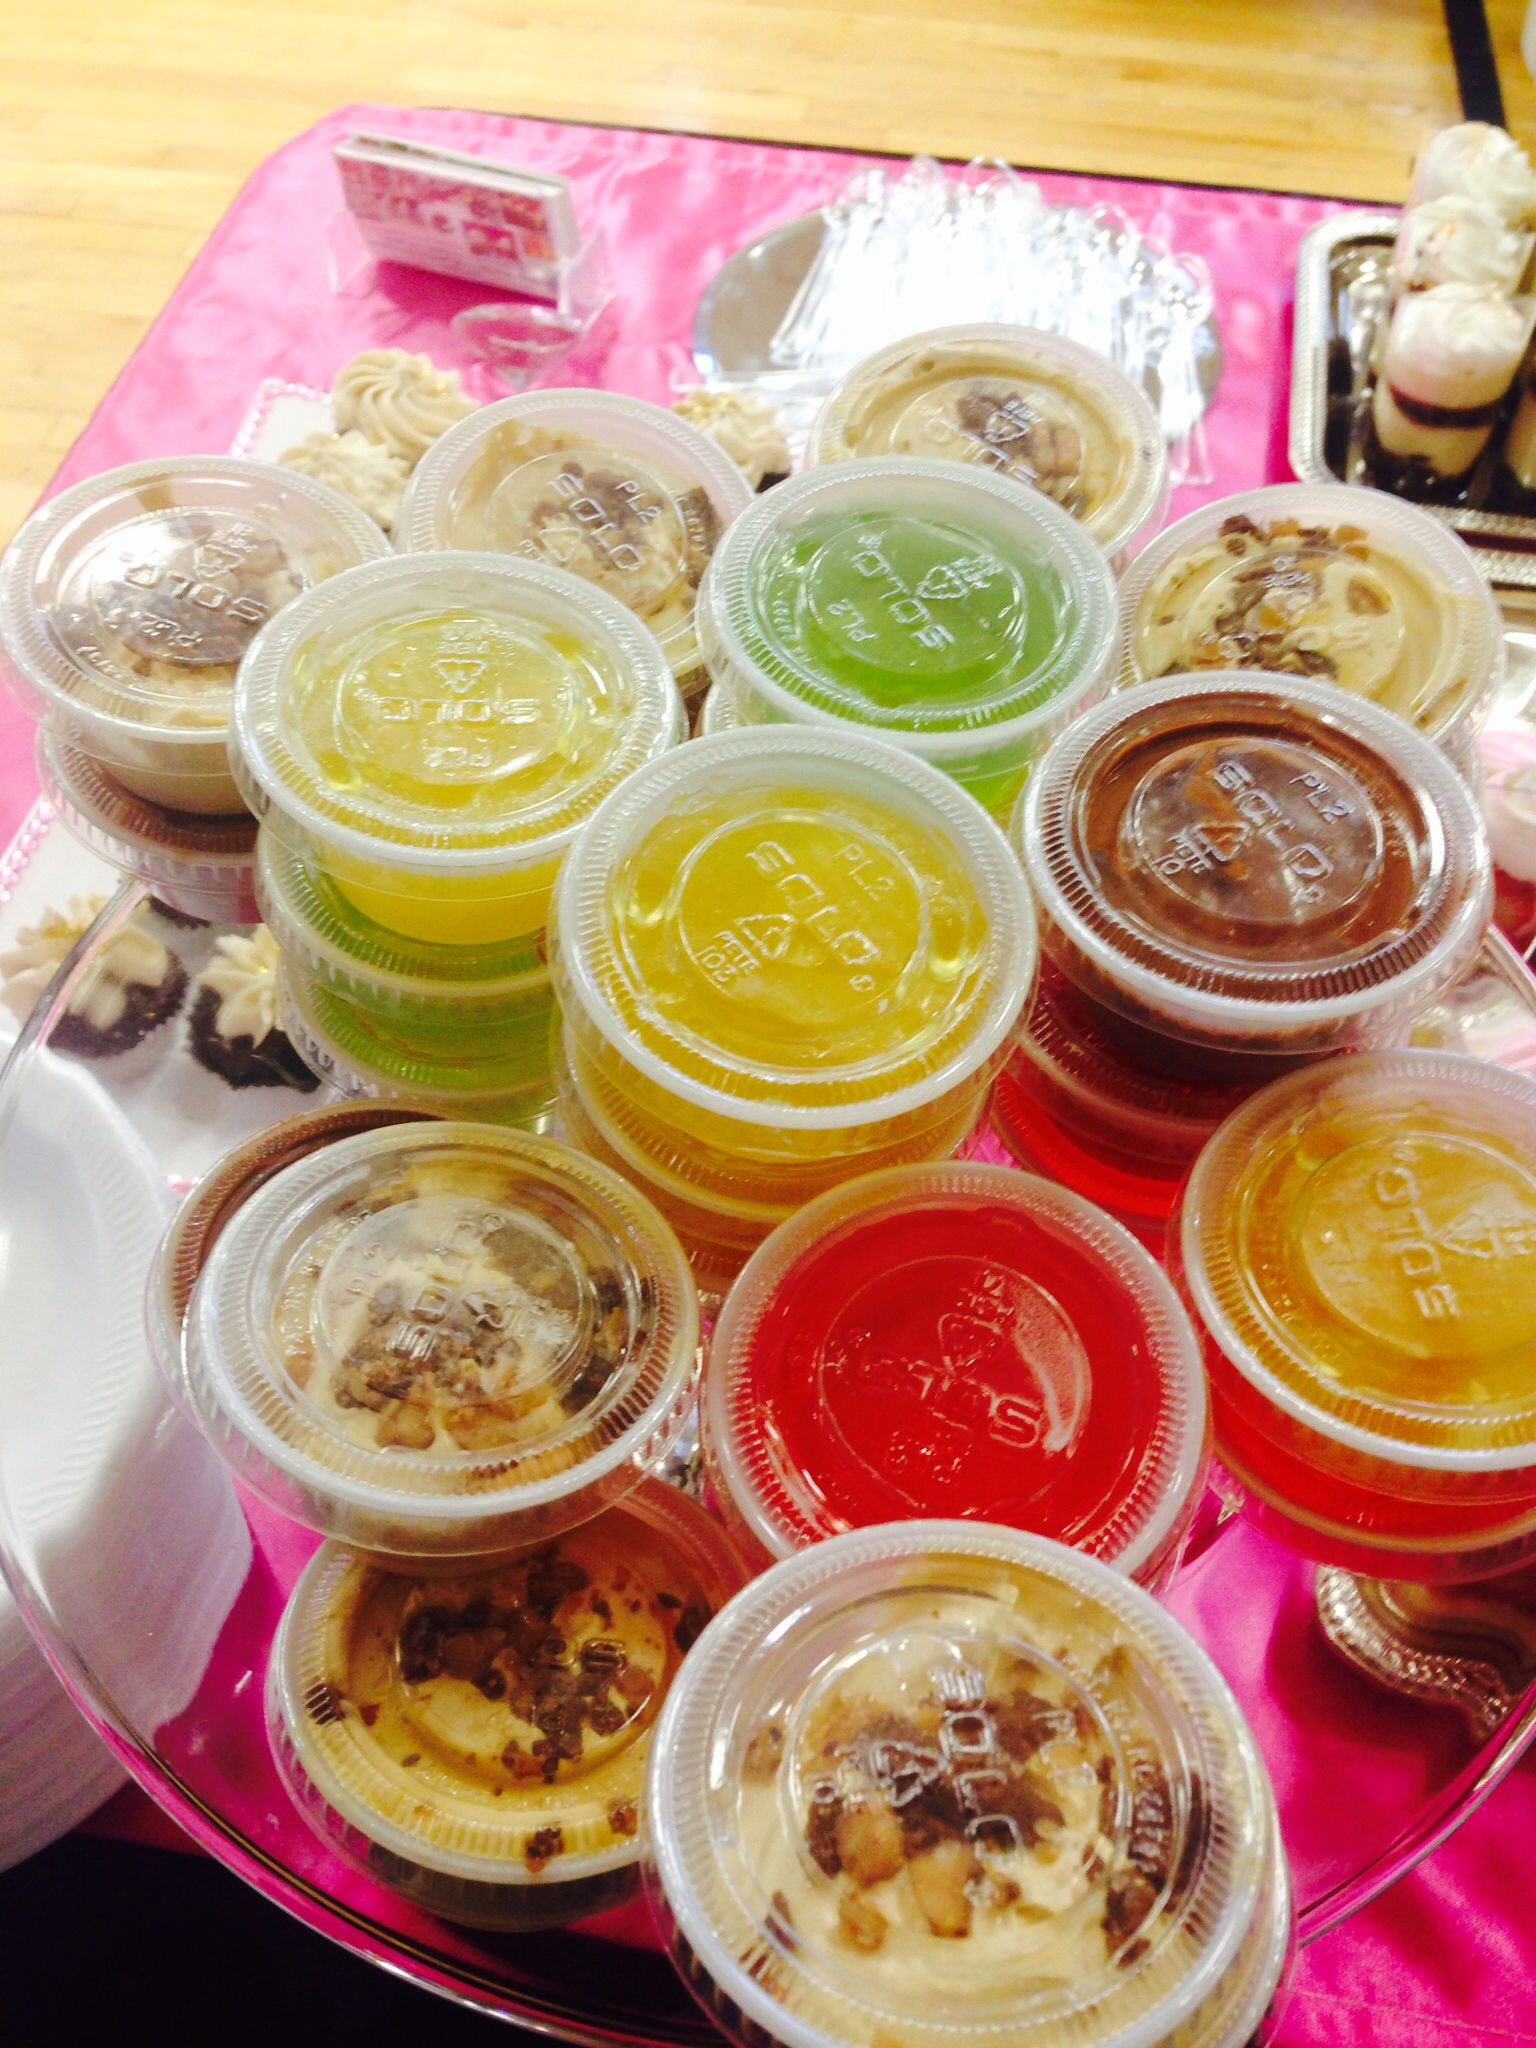 Jello  shots and pudding shots